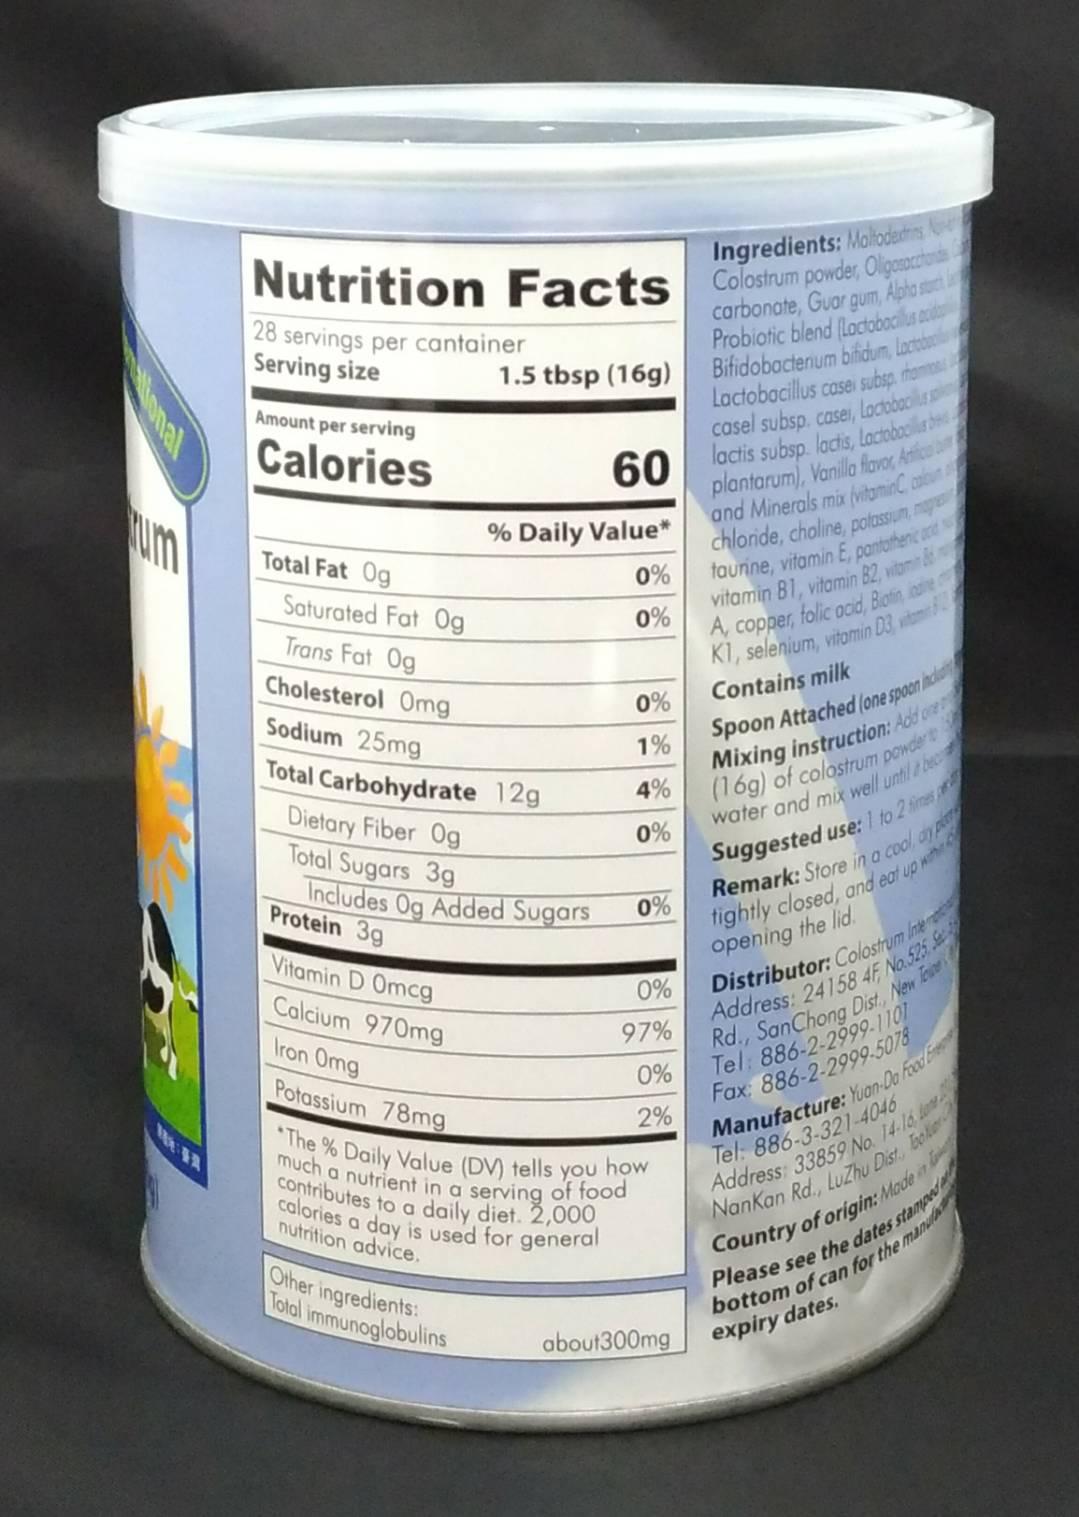 Colostrunm Powder - 牛初乳粉狀食品 - 初乳國際股份有限公司